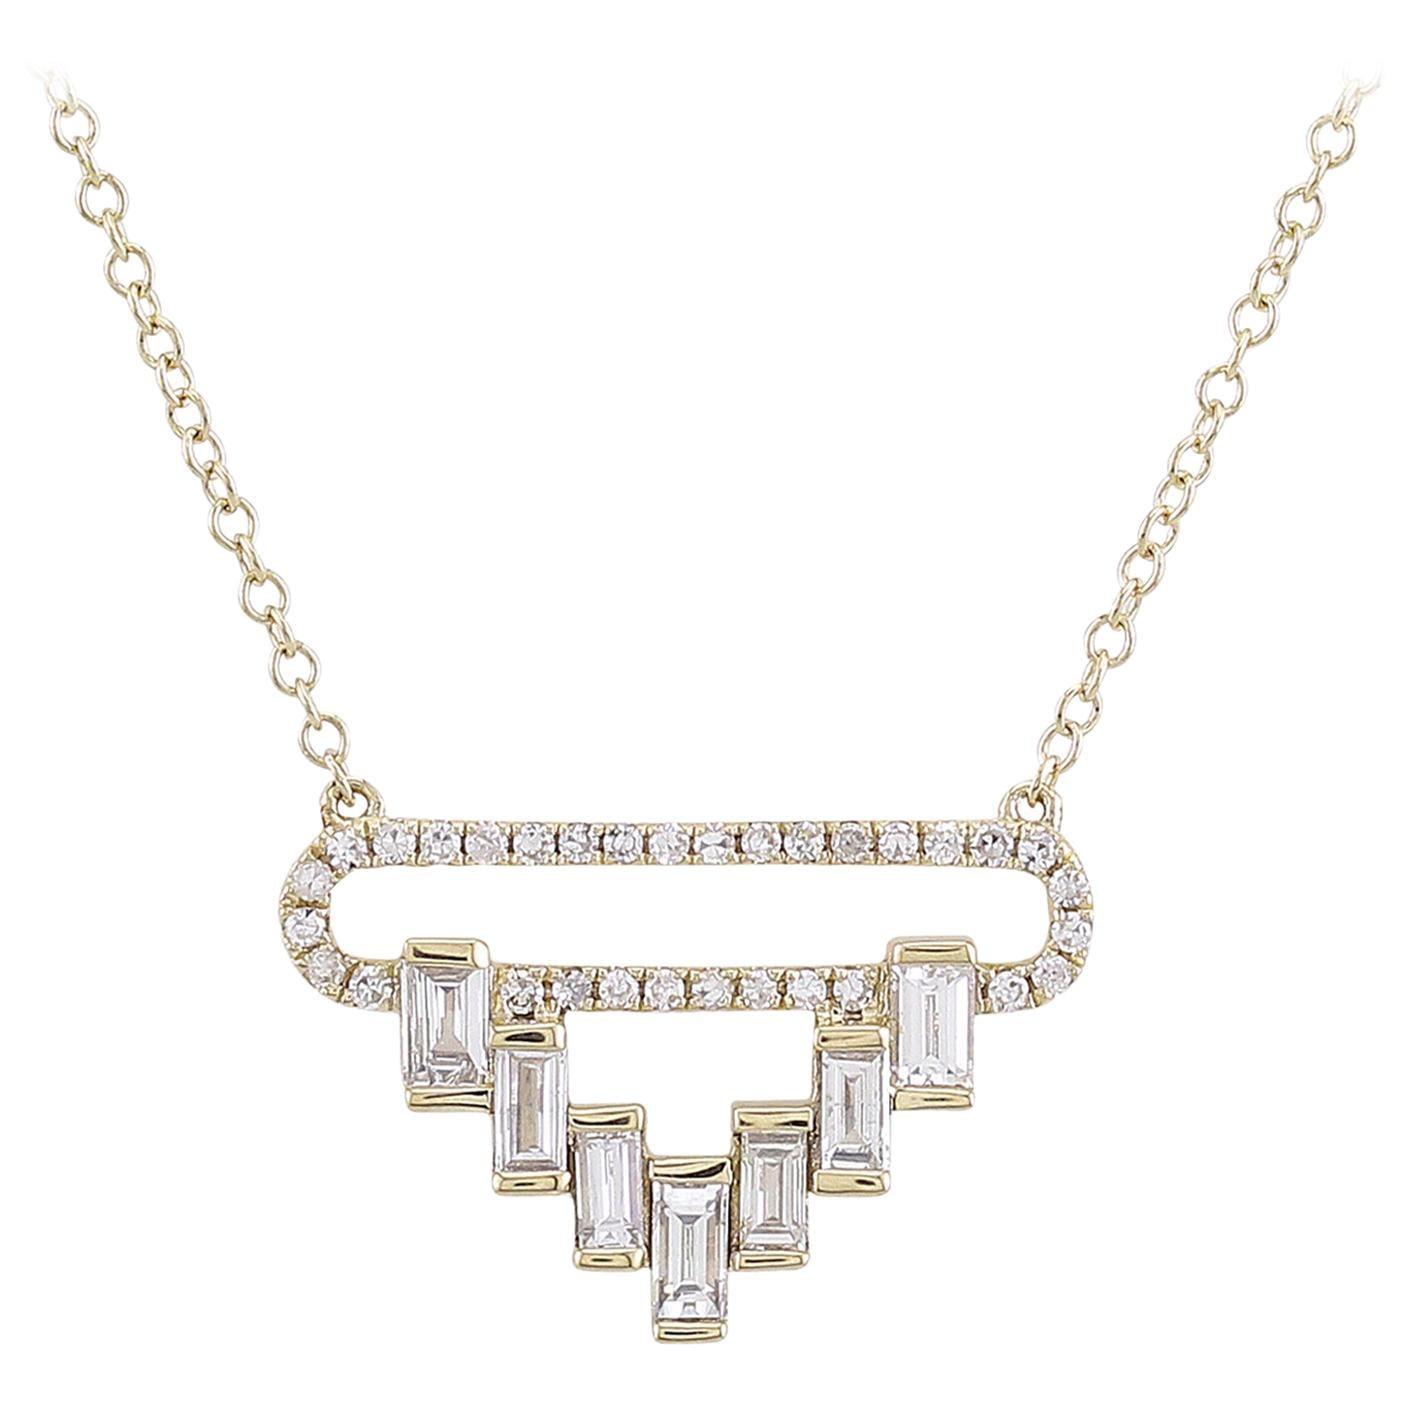 14 Karat Yellow Gold Baguette Diamond Pendant Necklace